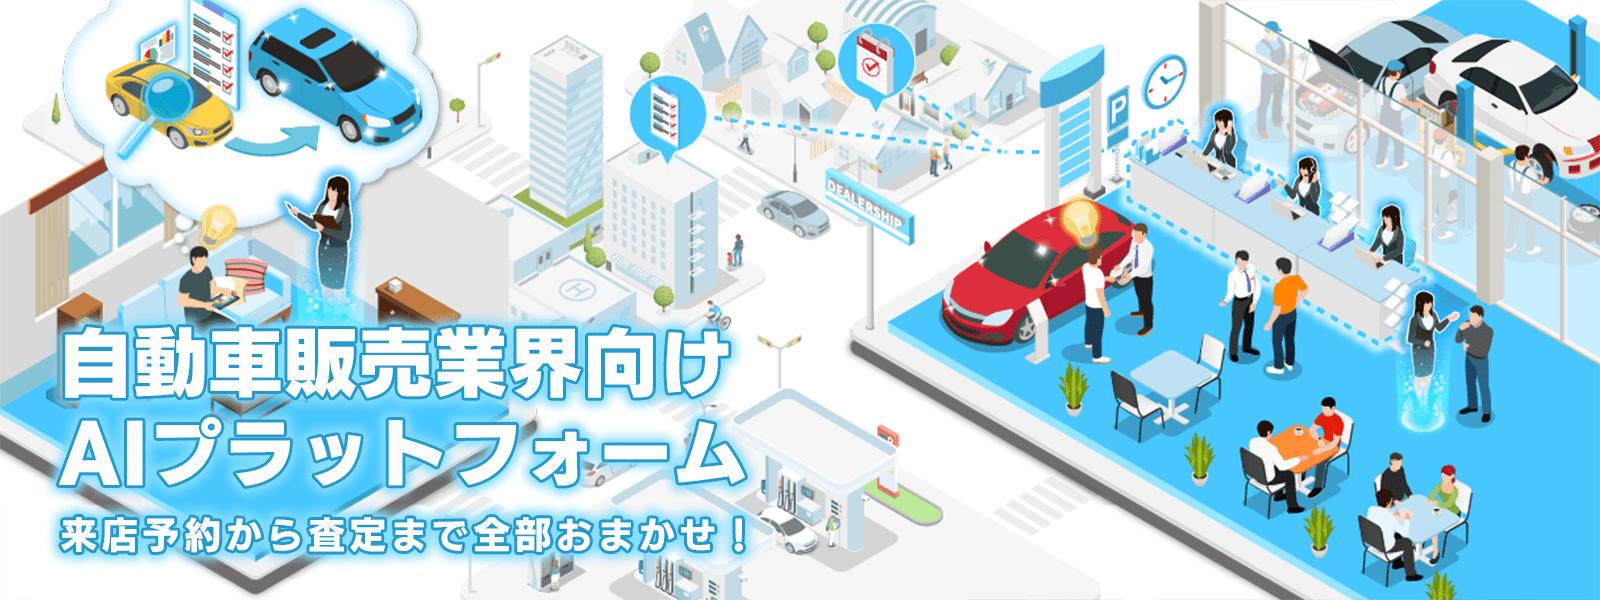 自動車販売業界向けAI